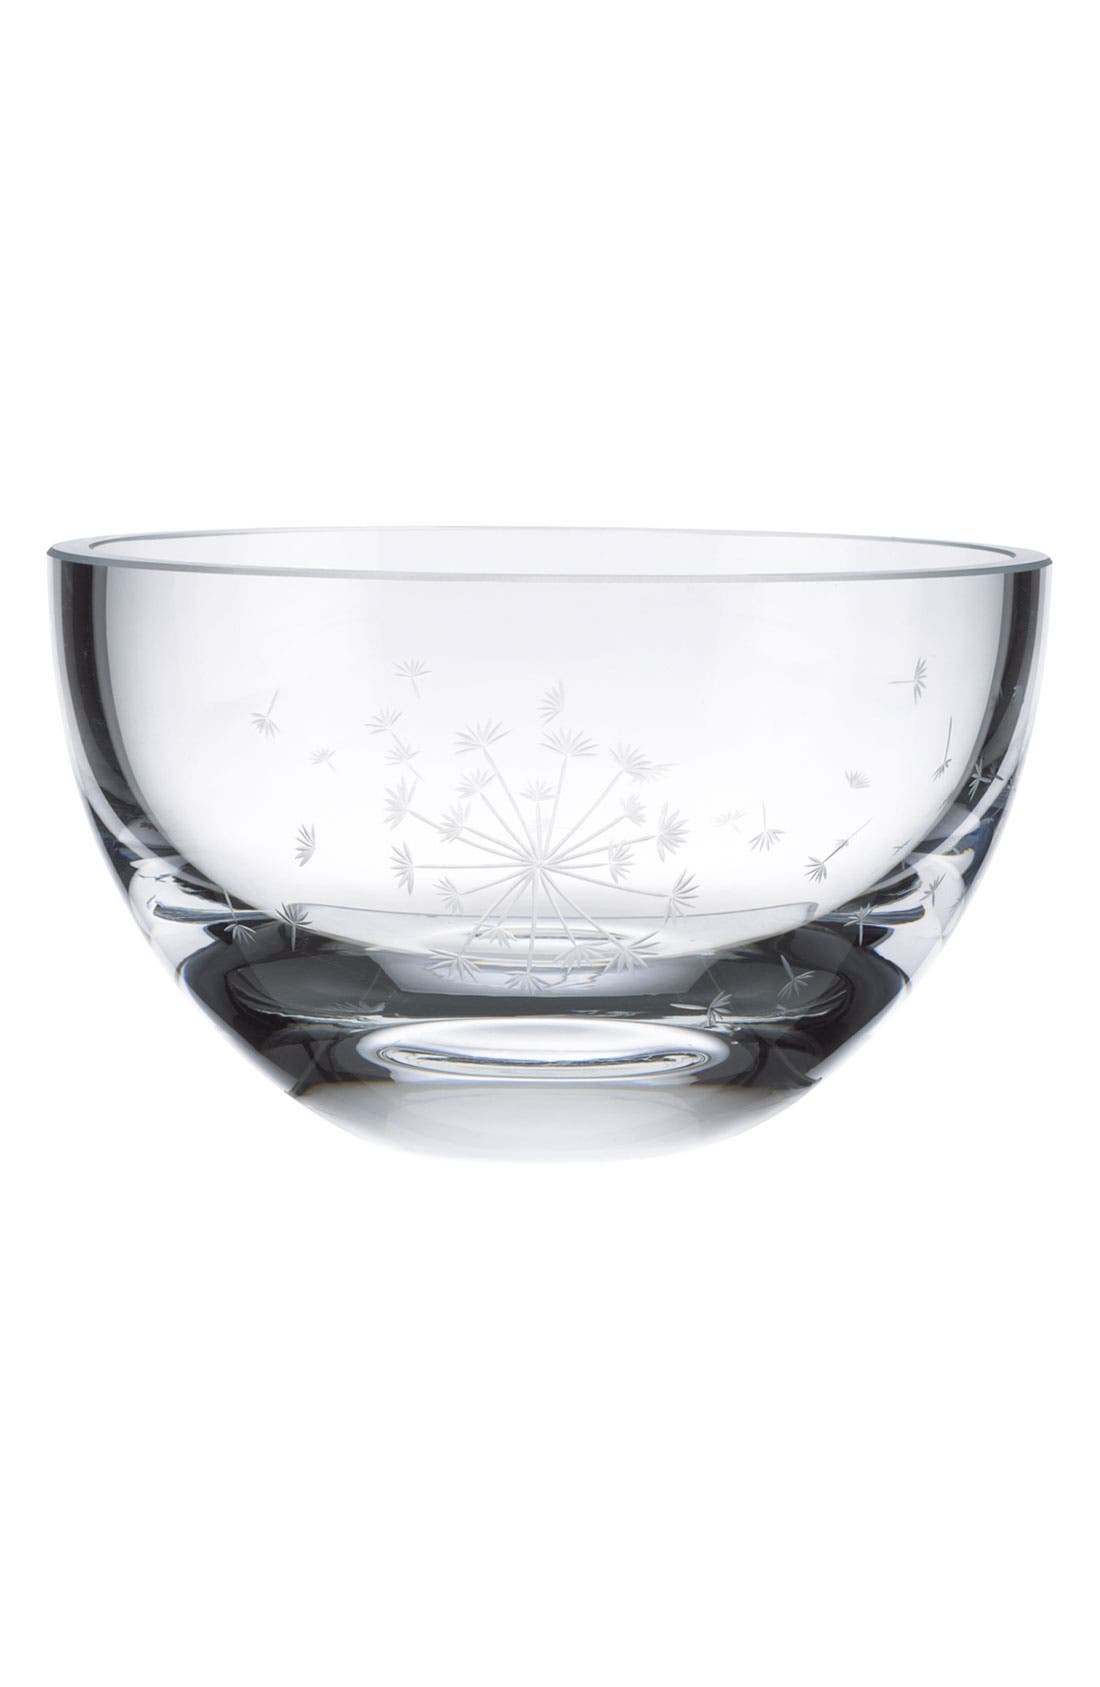 Main Image - kate spade new york 'dandy lane' bowl